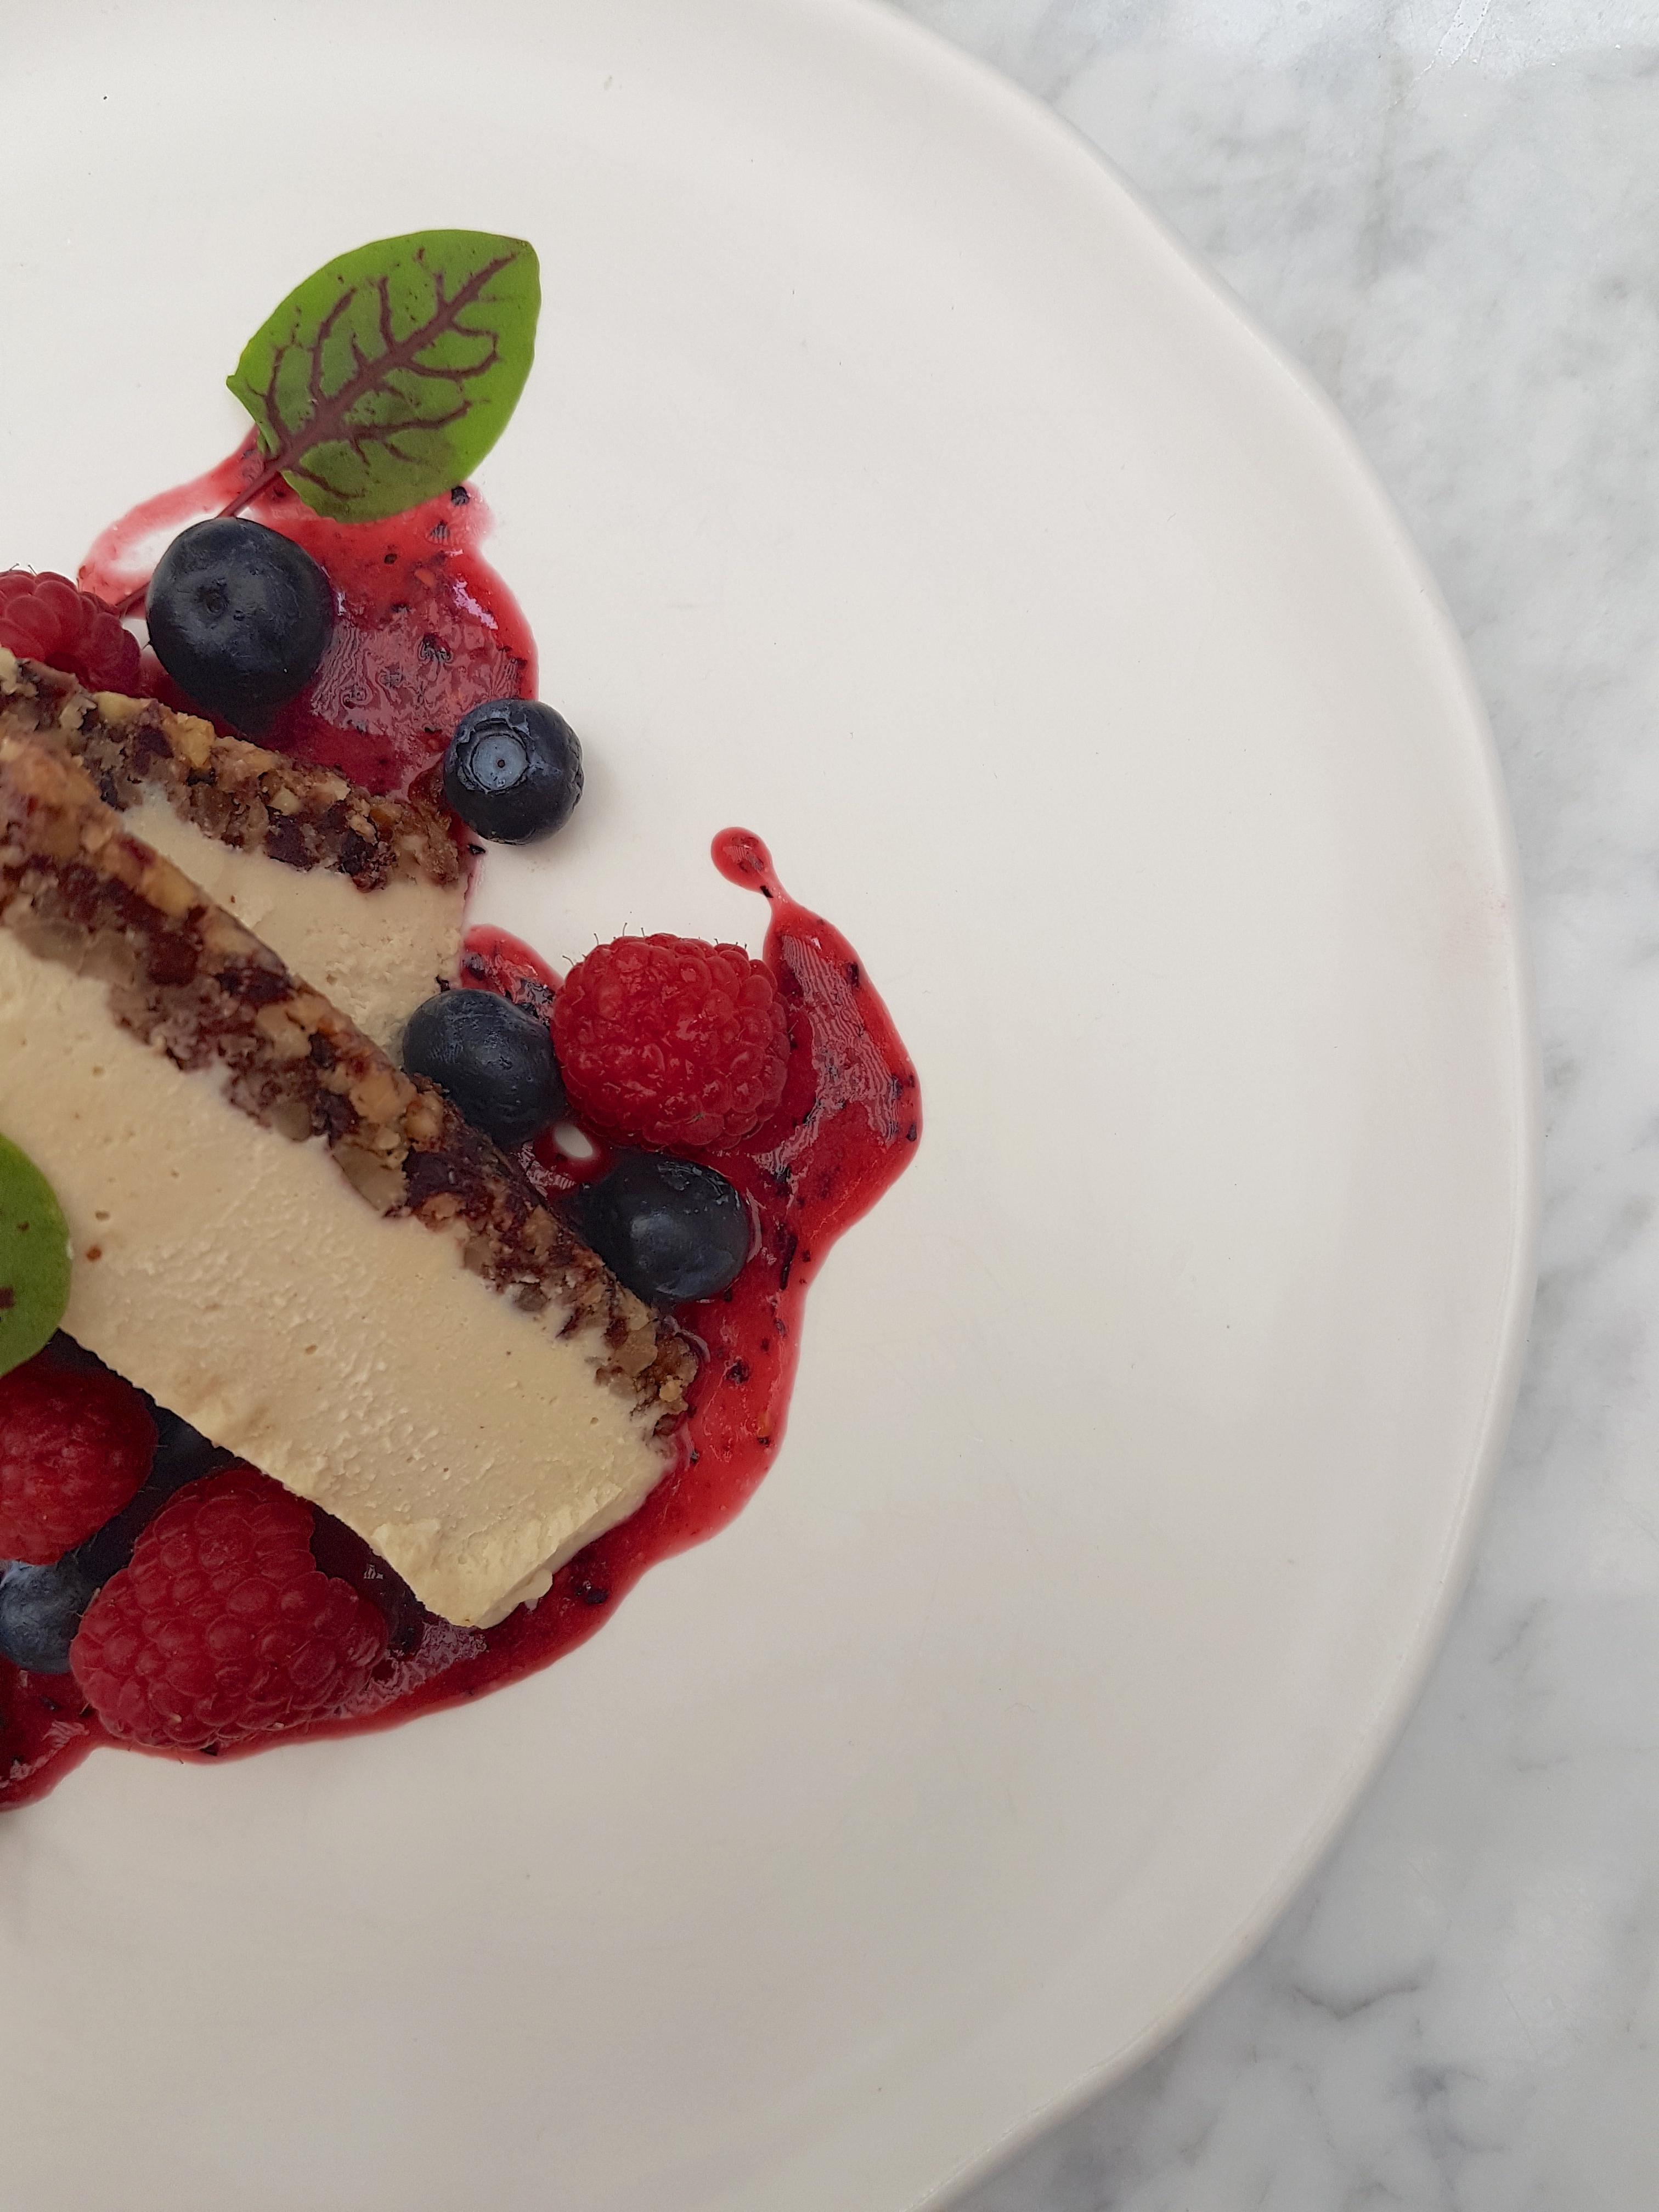 Gâteau au FAUXmage, Lov